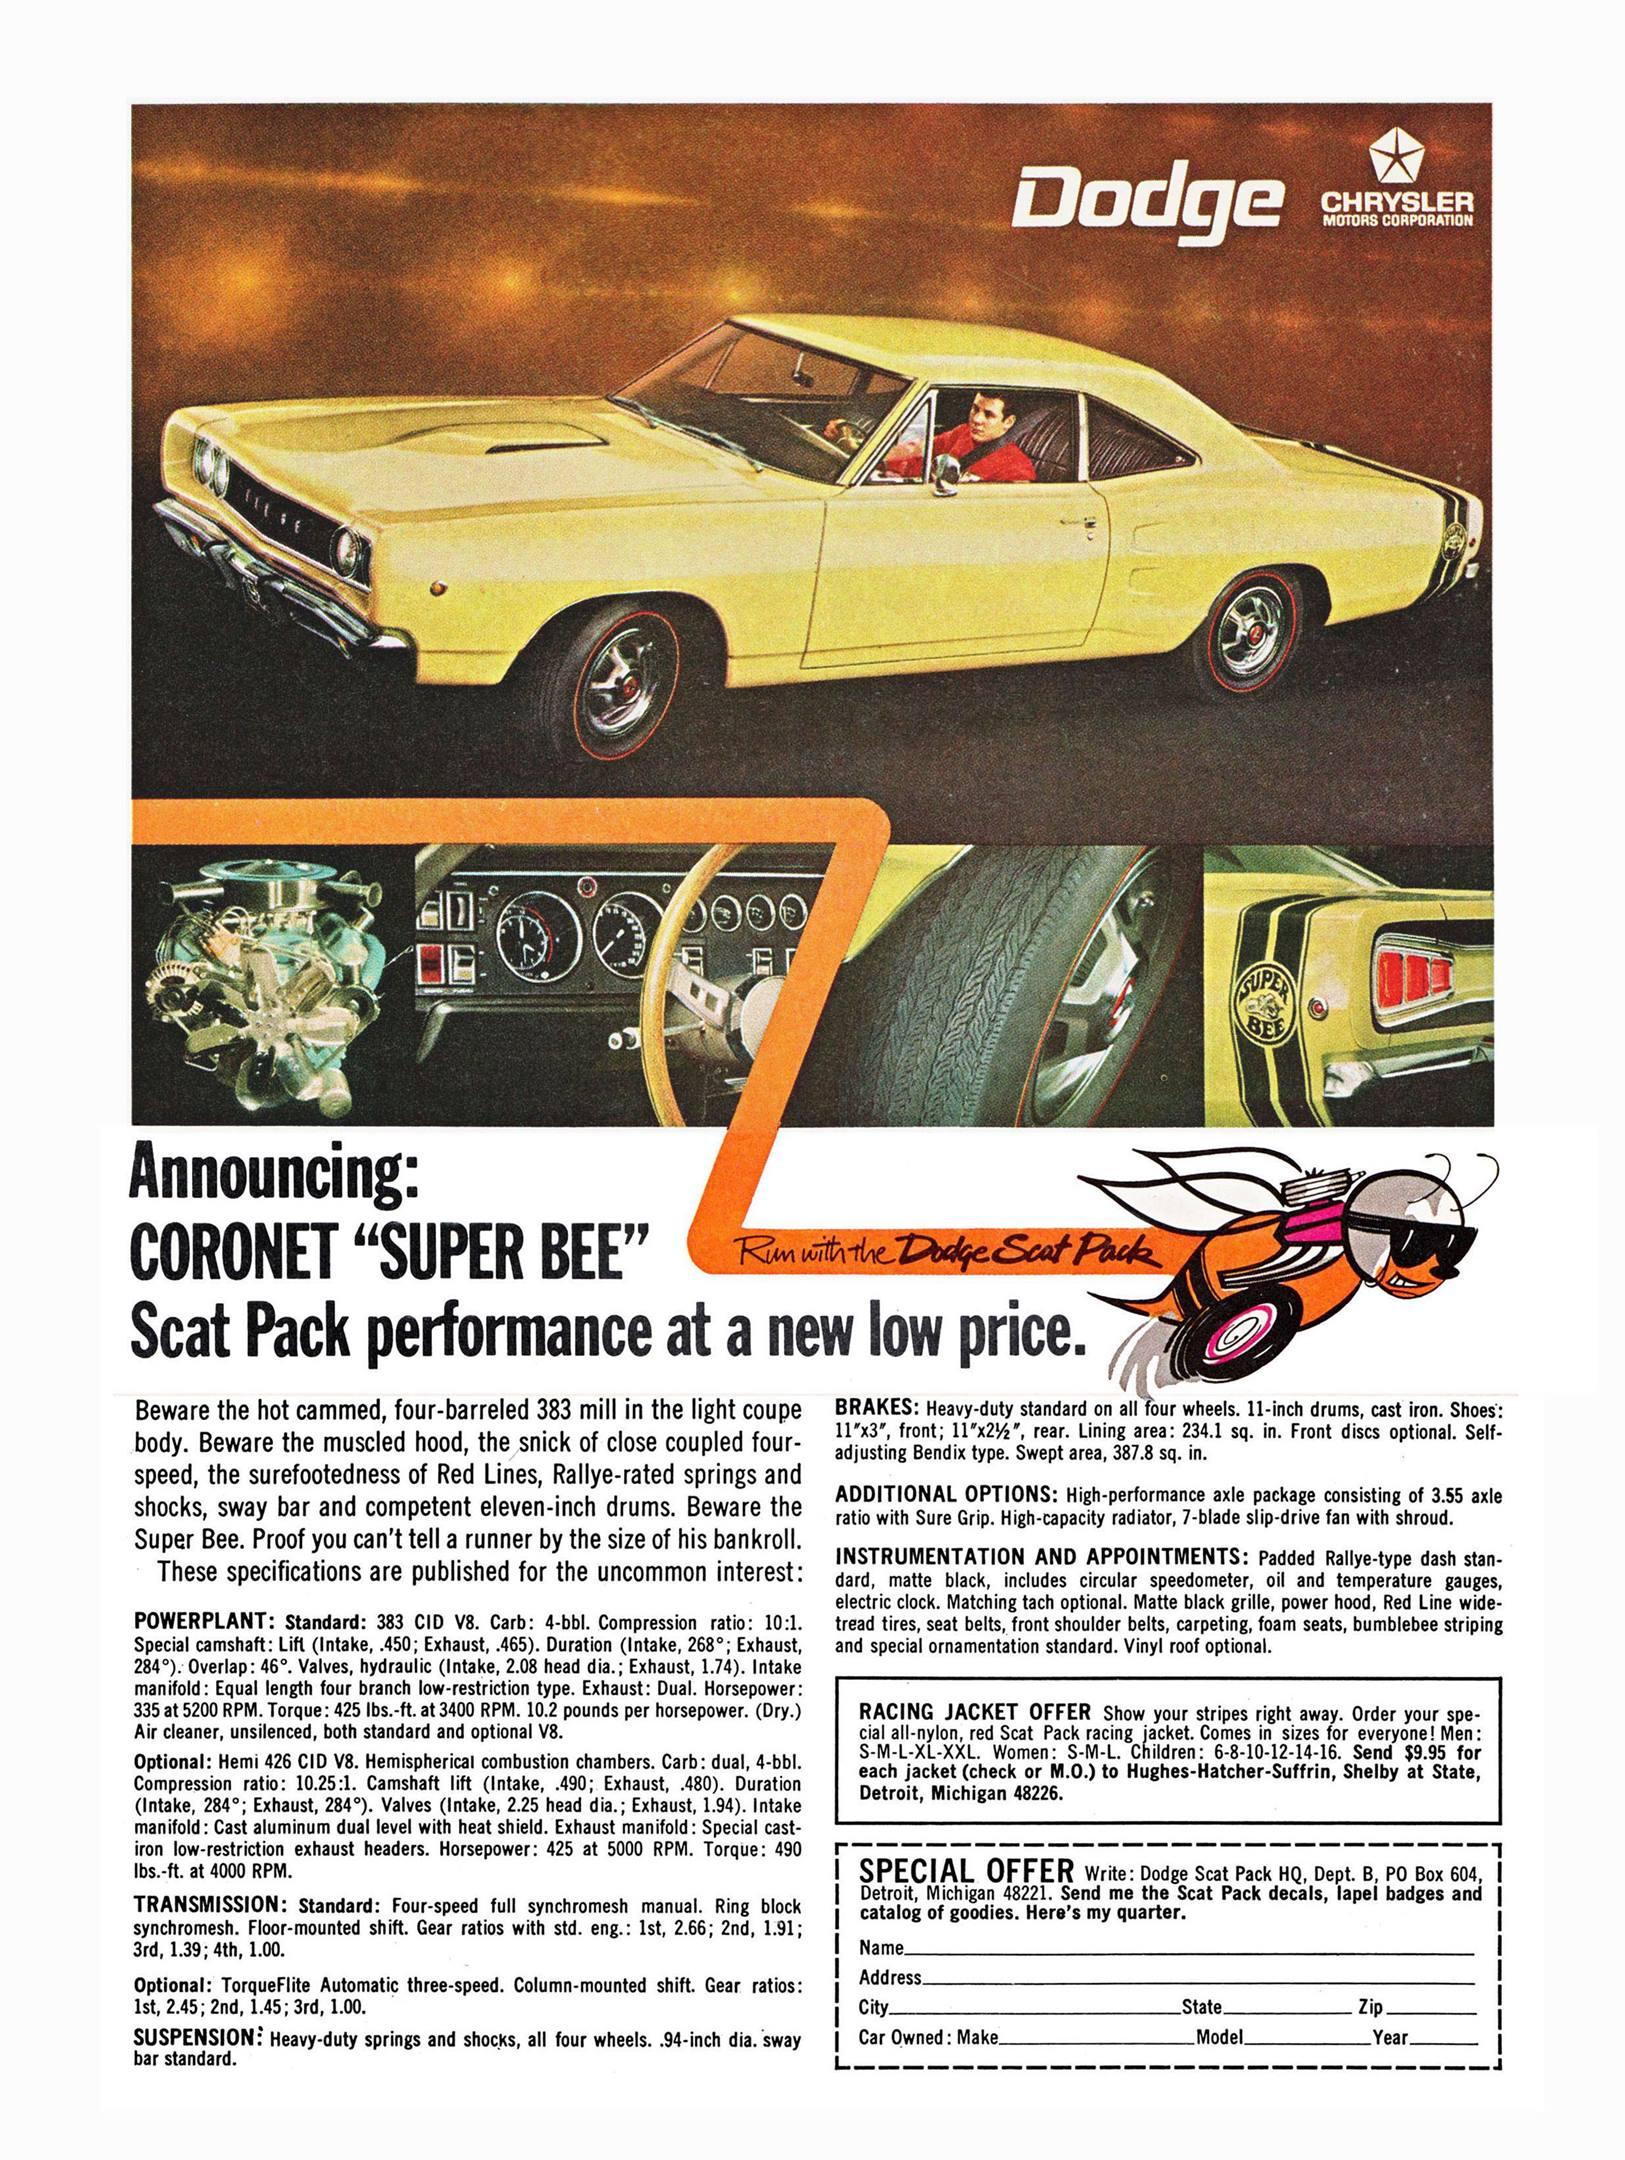 1968 Dodge Super Bee ad